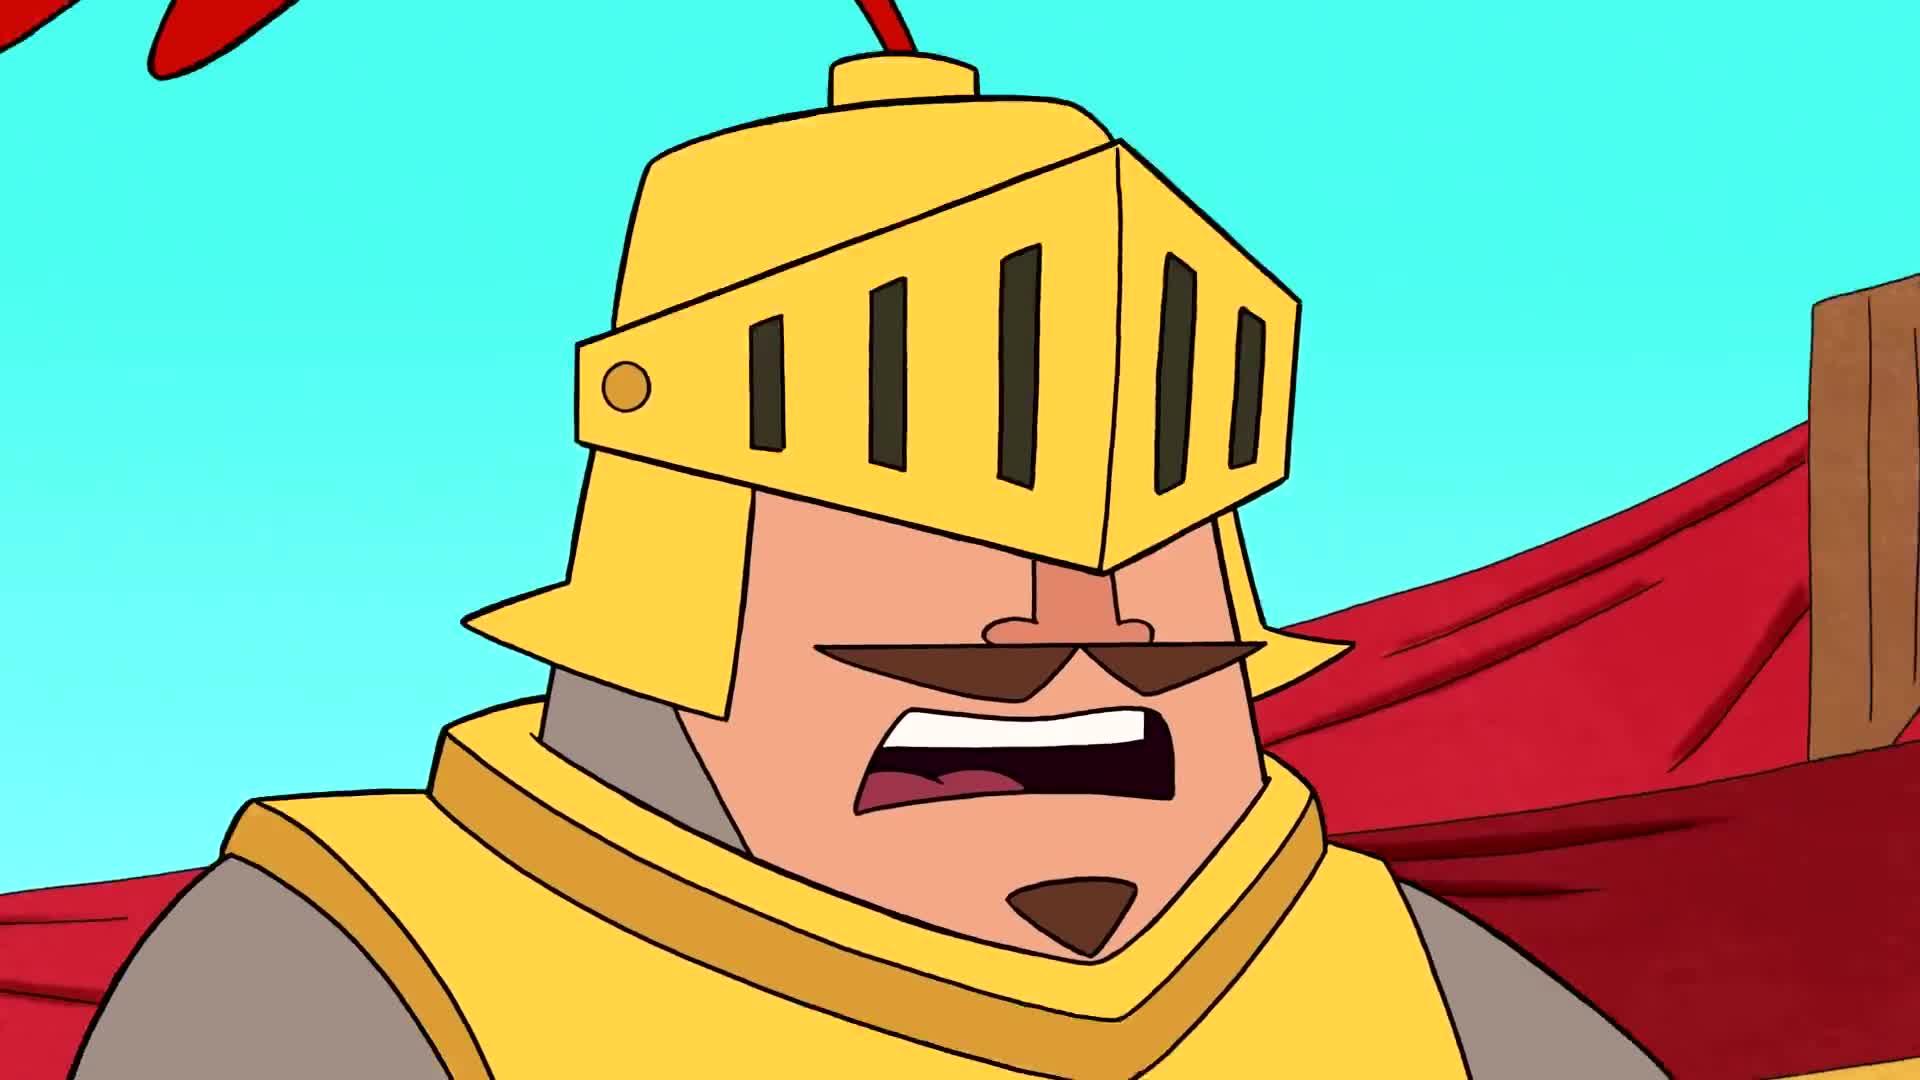 Coc Clash Clans Animation Clash Clans Attacks